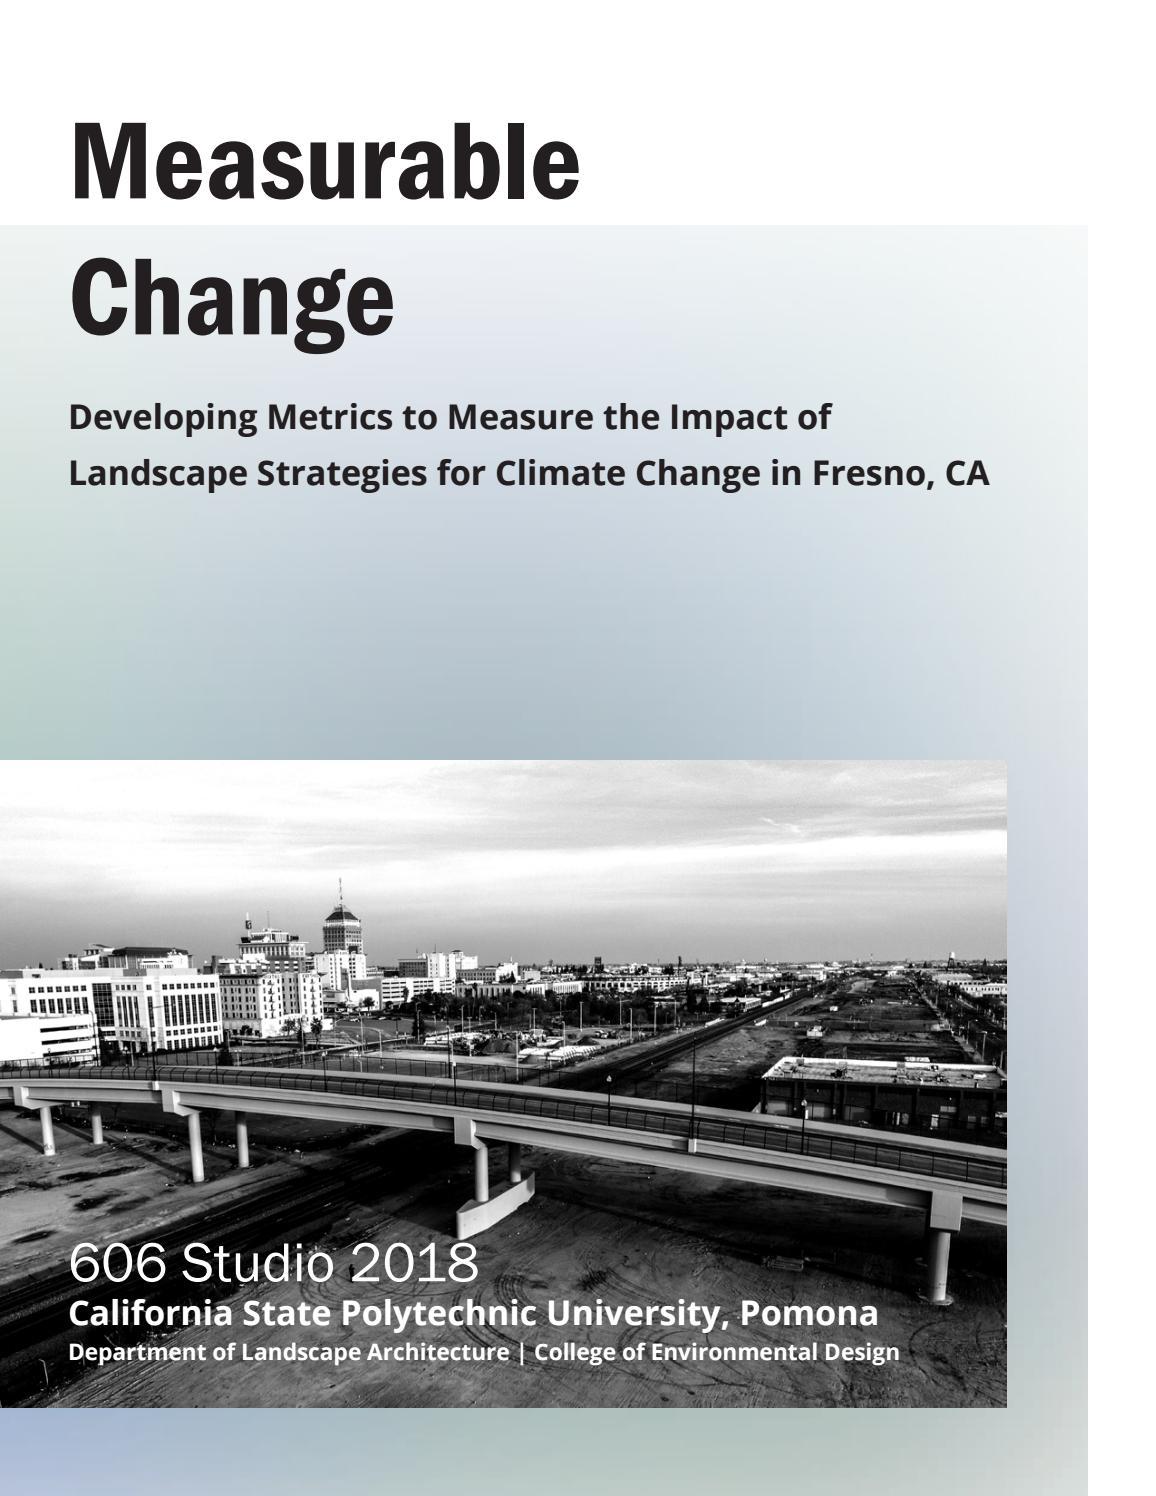 Measurable Change - Cal Poly Pomona - 606 Studio Master's